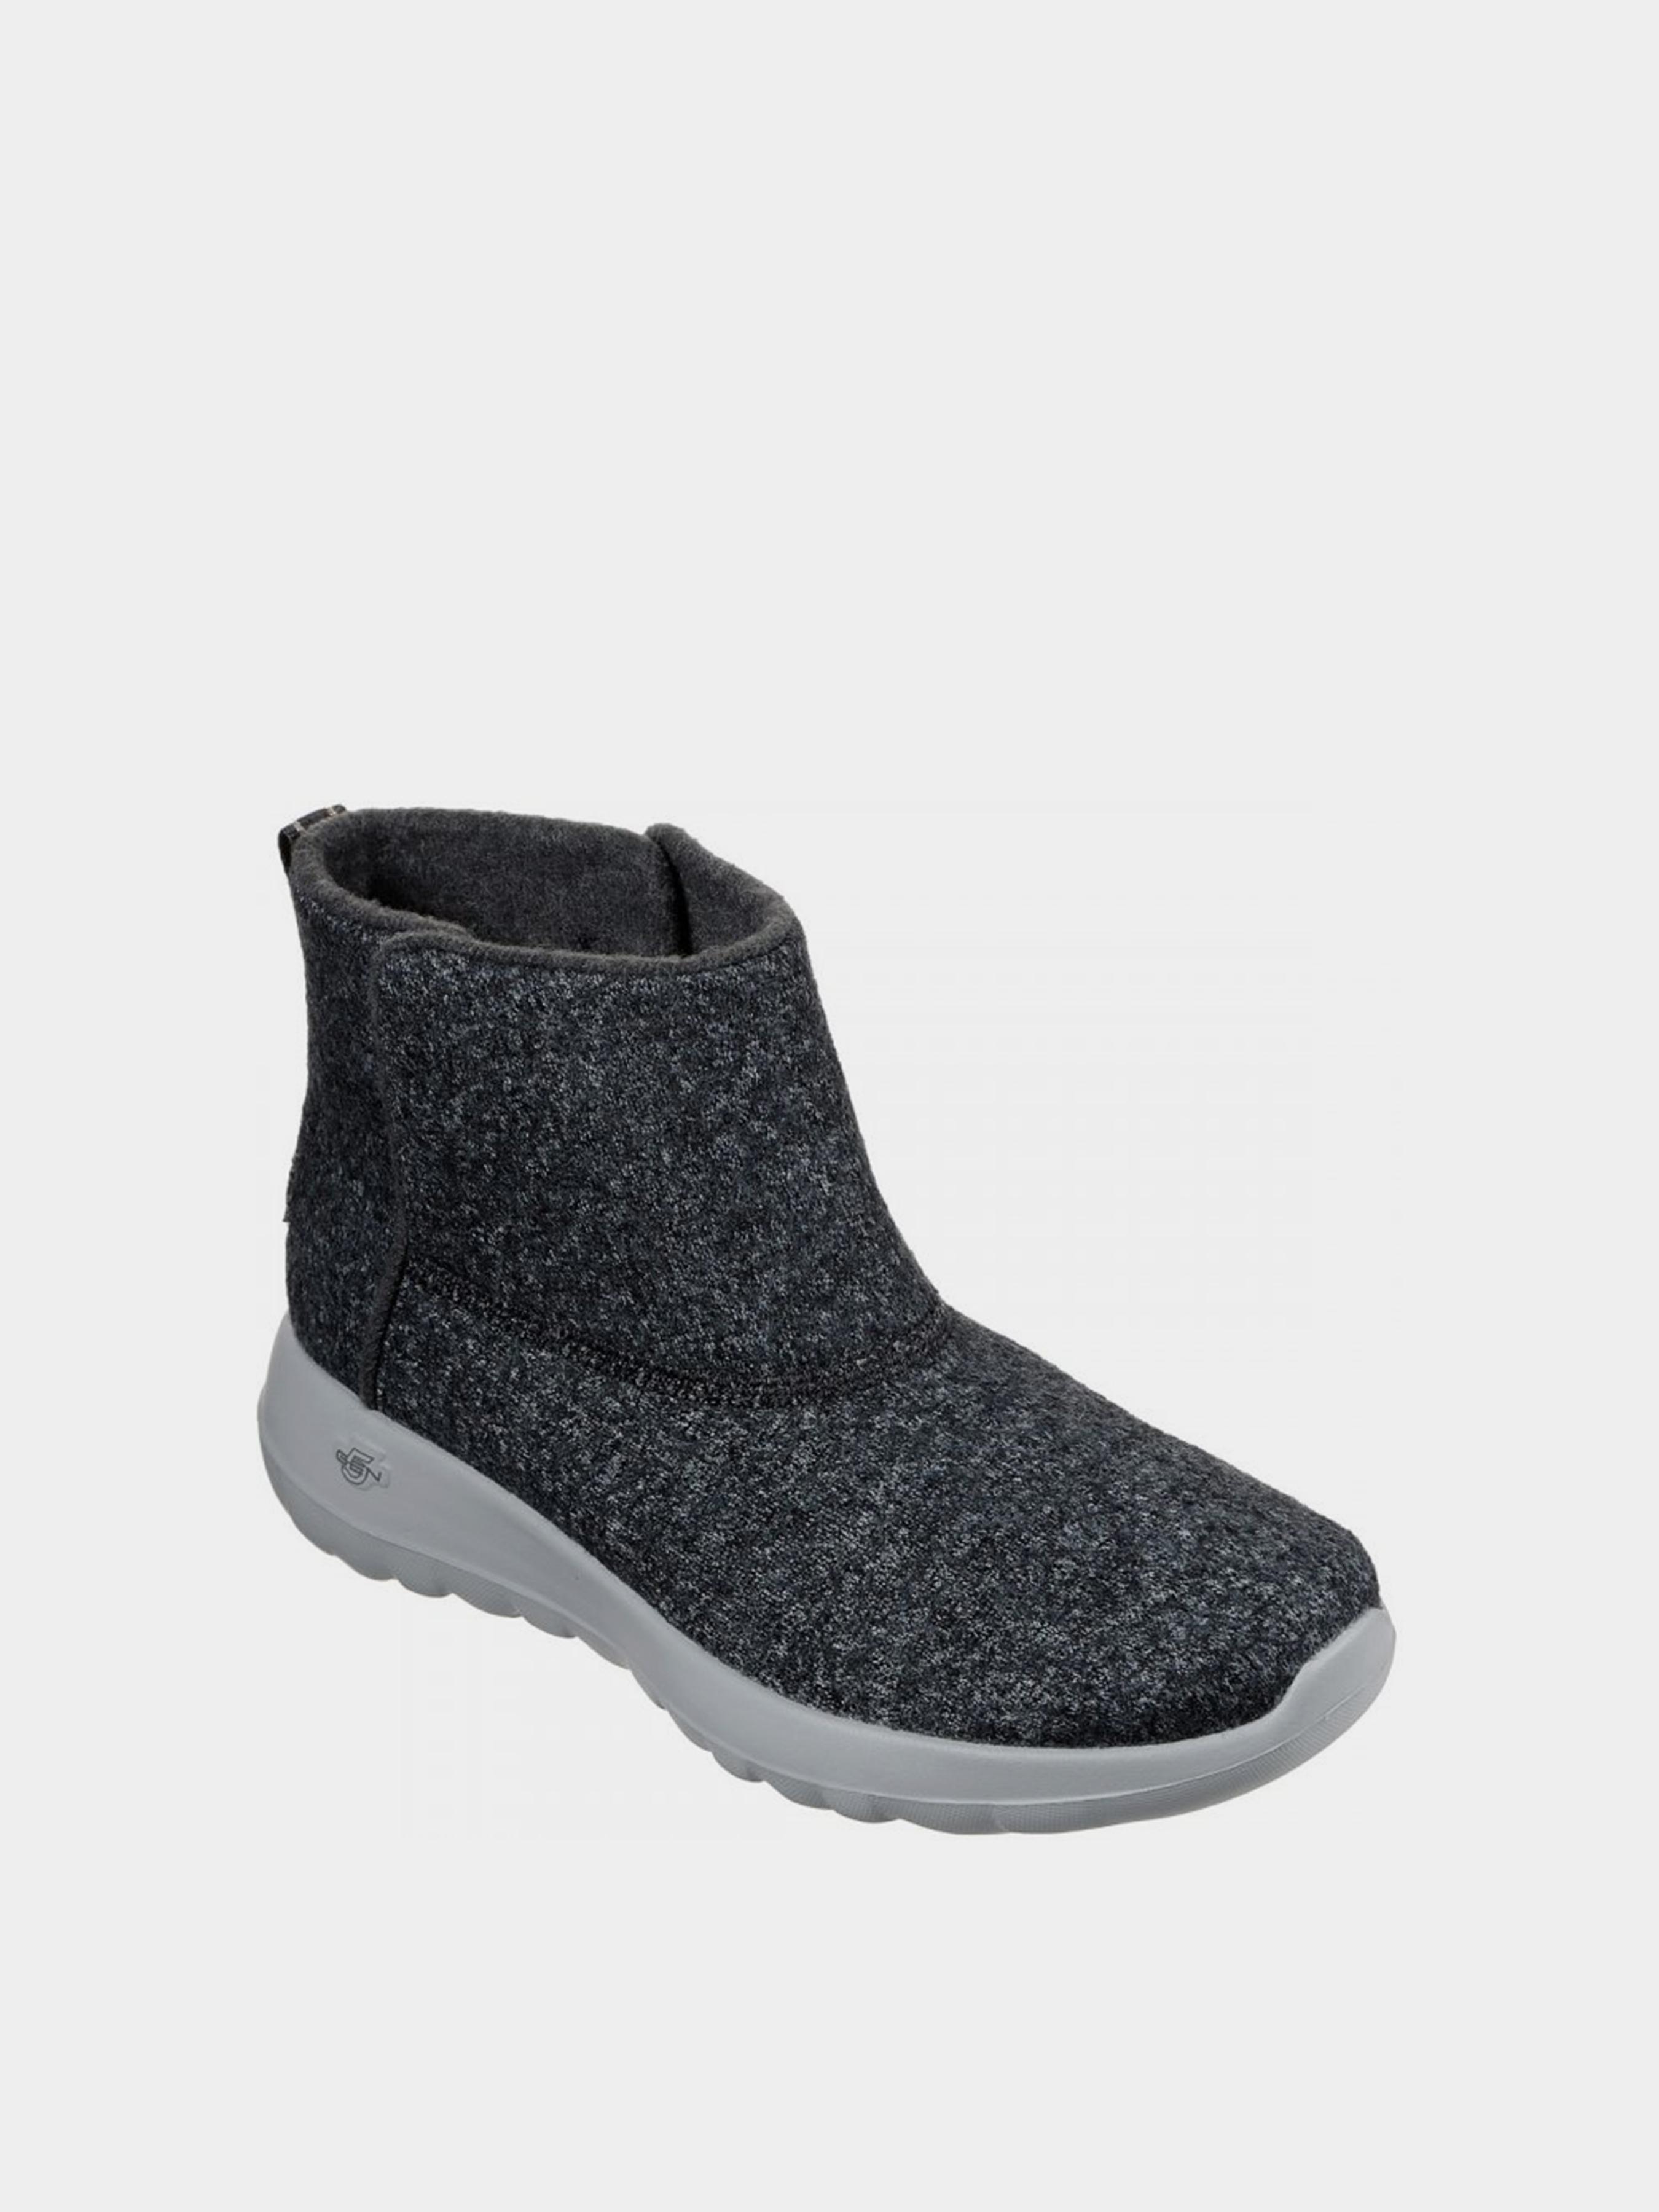 Ботинки для женщин Skechers KW5232 размеры обуви, 2017